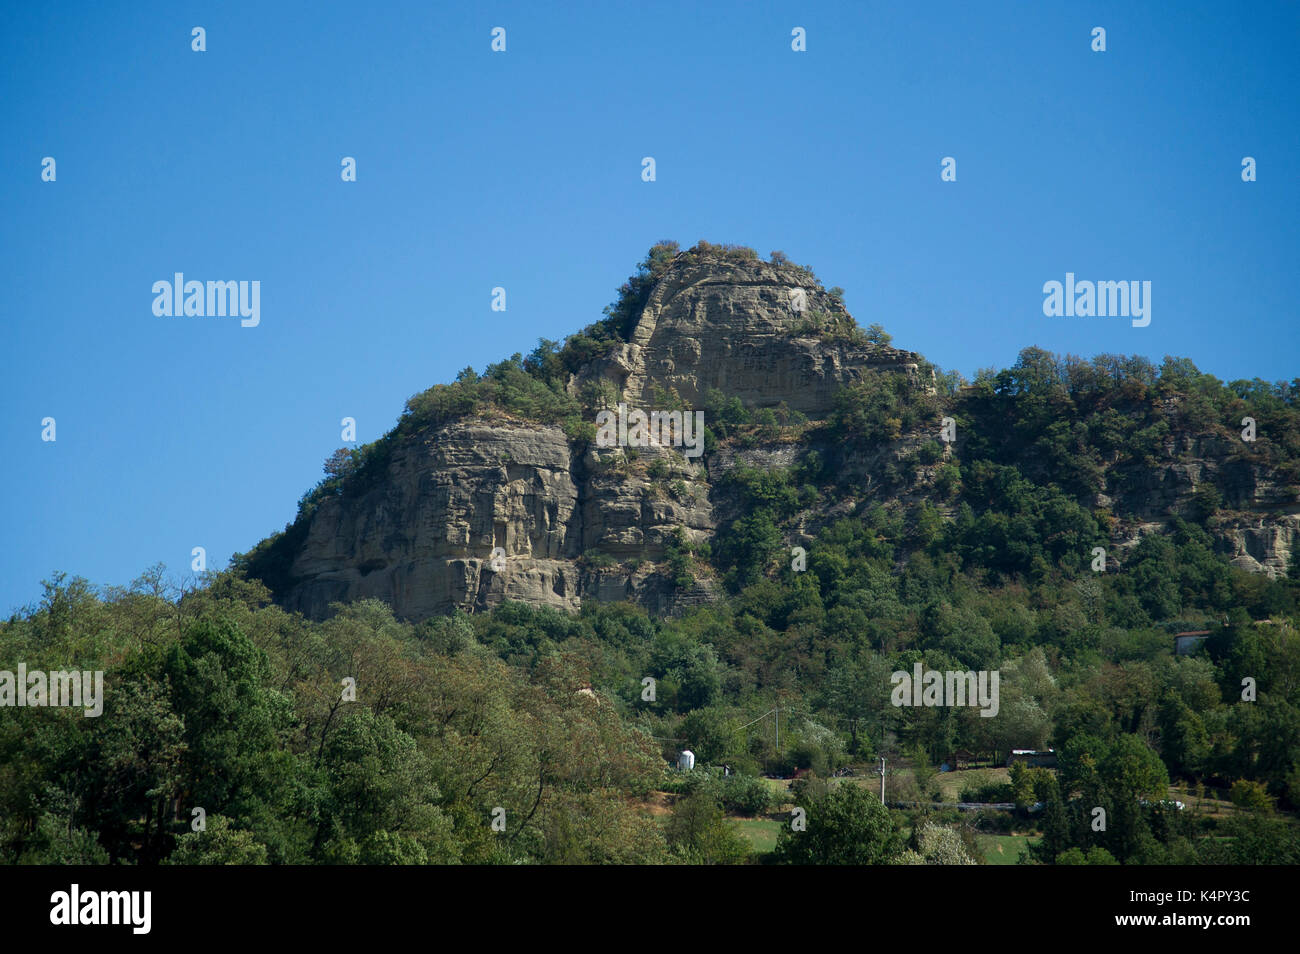 Emilian Apennin toscan montagnes de l'Autostrada A1 Milano-Napoli appelée Autostrada del Sole, en Italie. 1 Septembre 2017 © Wojciech Strozyk / Alam Photo Stock